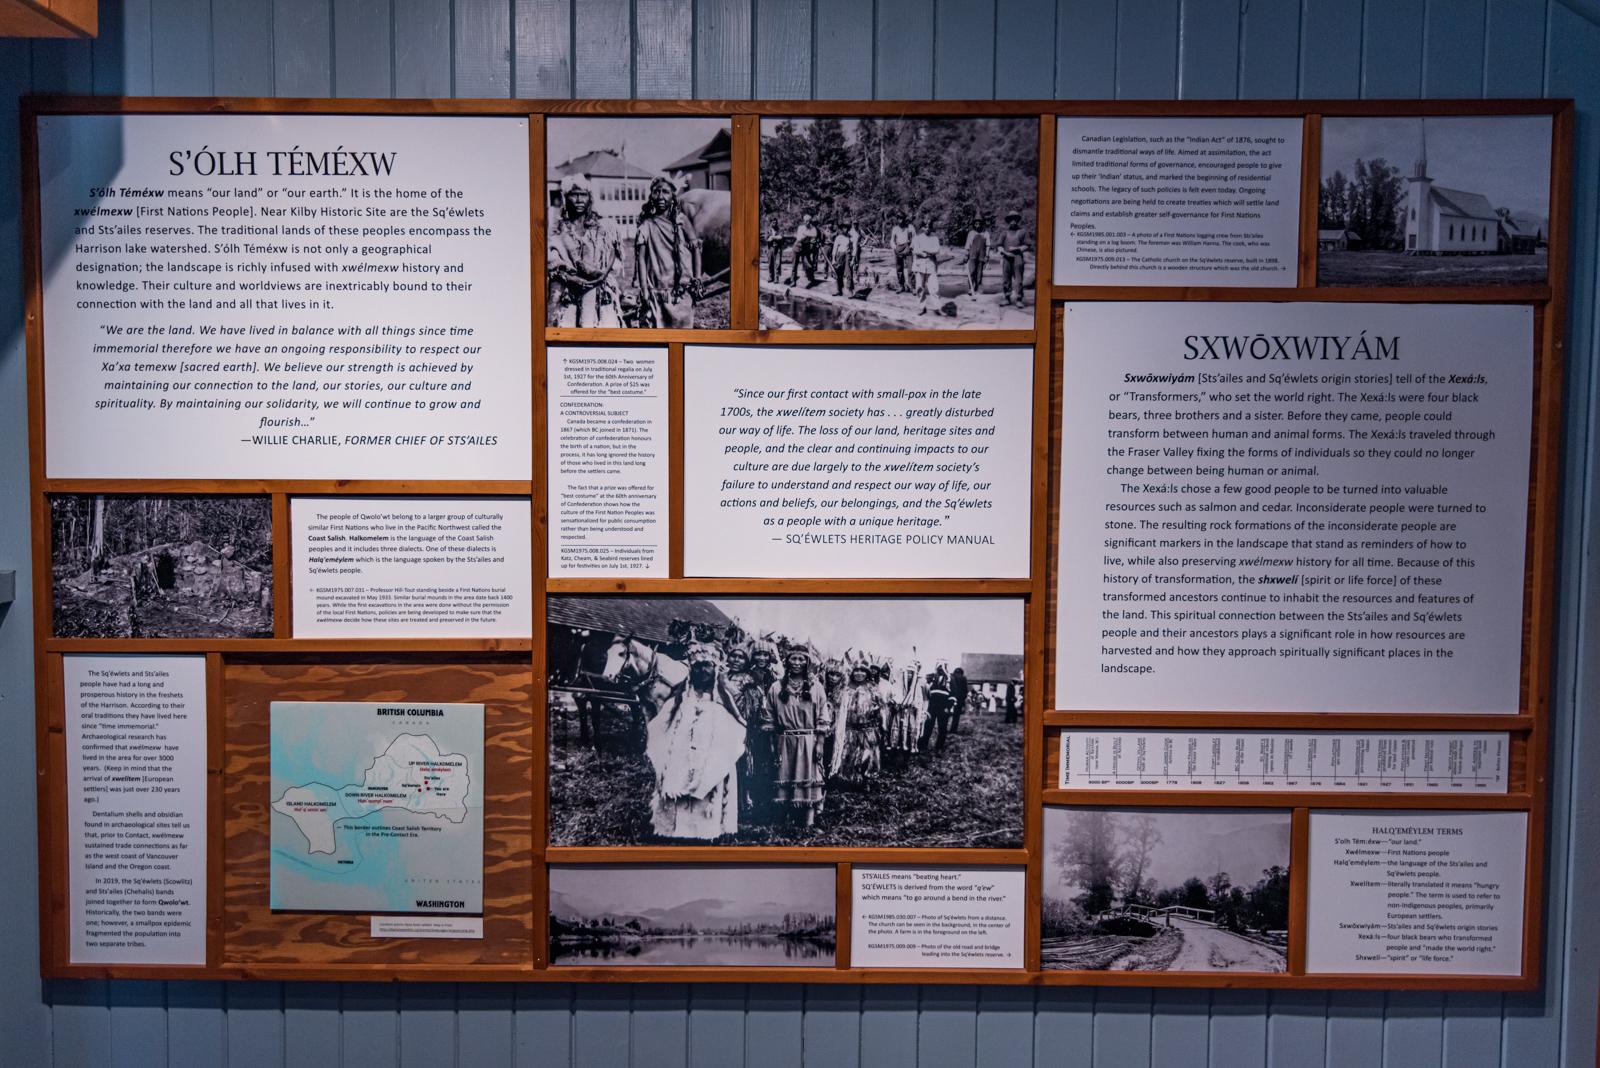 Kilby Historic Site